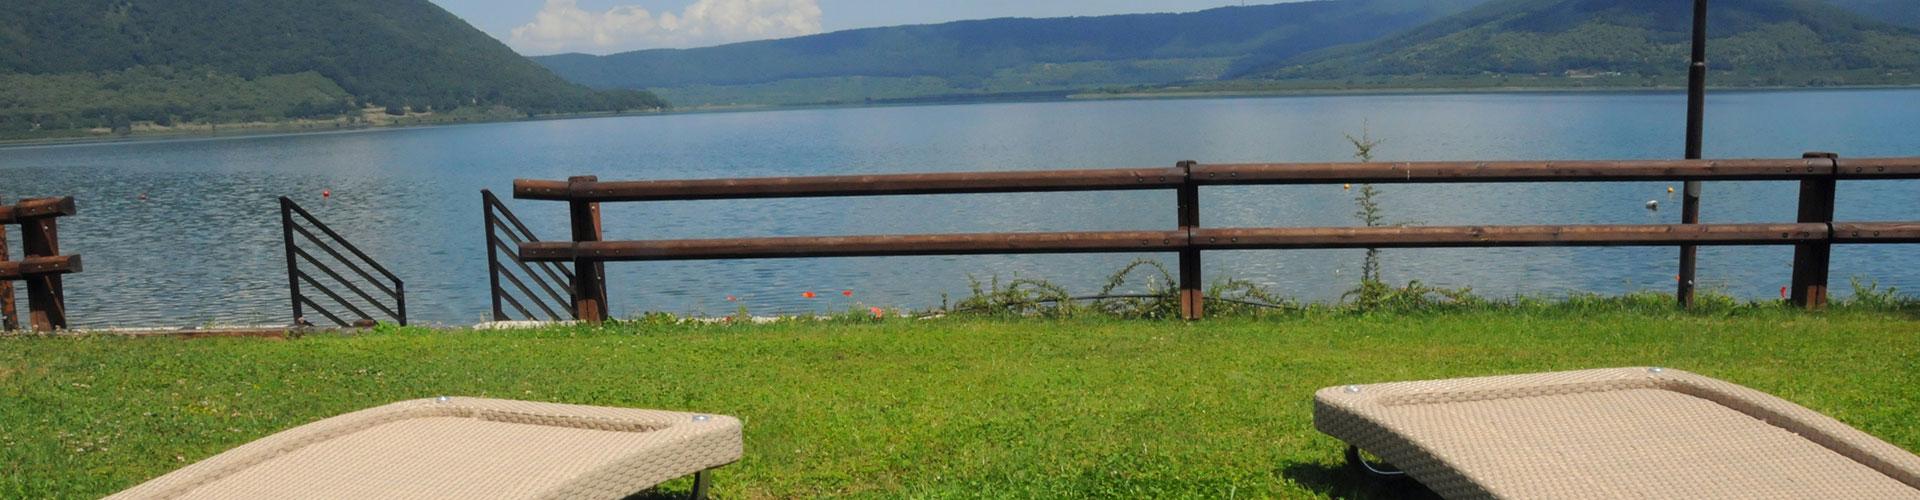 Potrete rilassarvi sul prato godendovi il panorama.